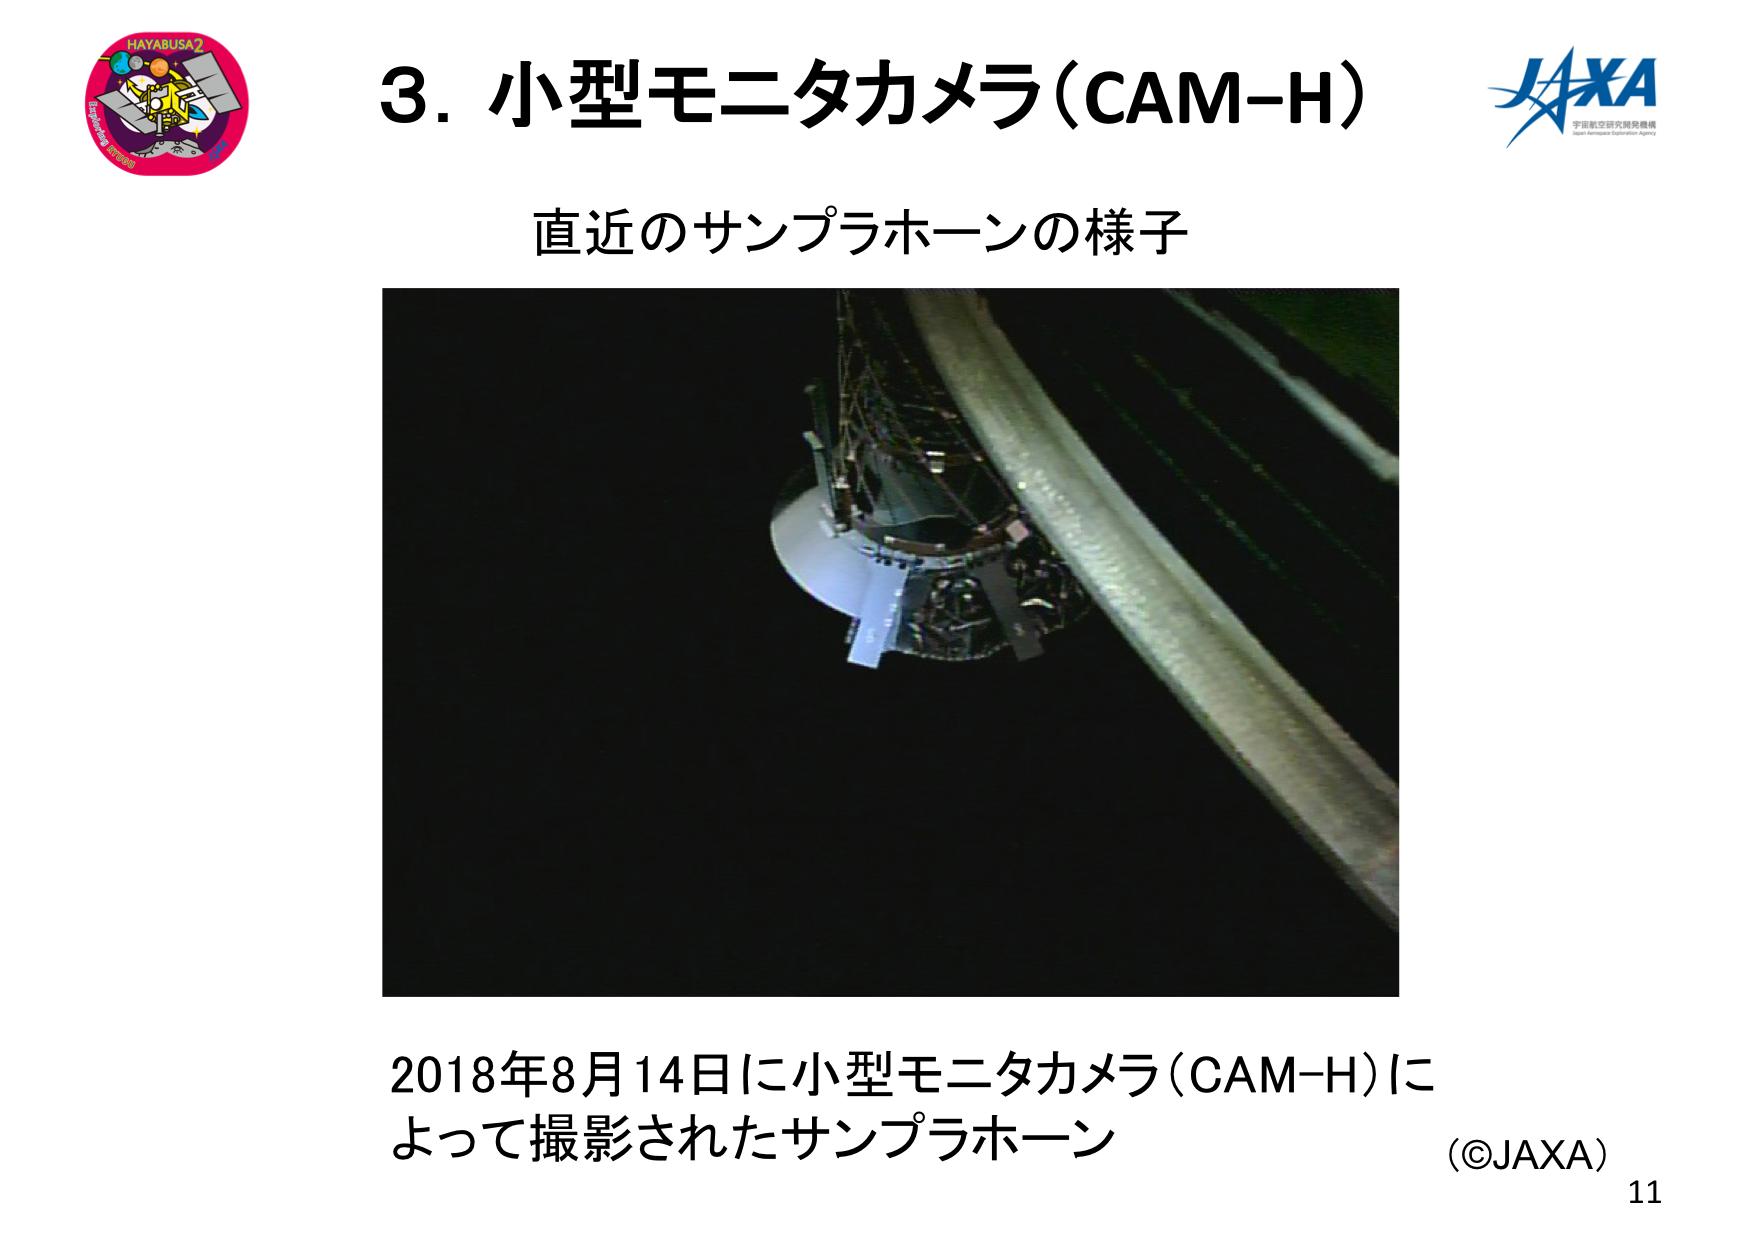 f:id:Imamura:20180905231943p:plain